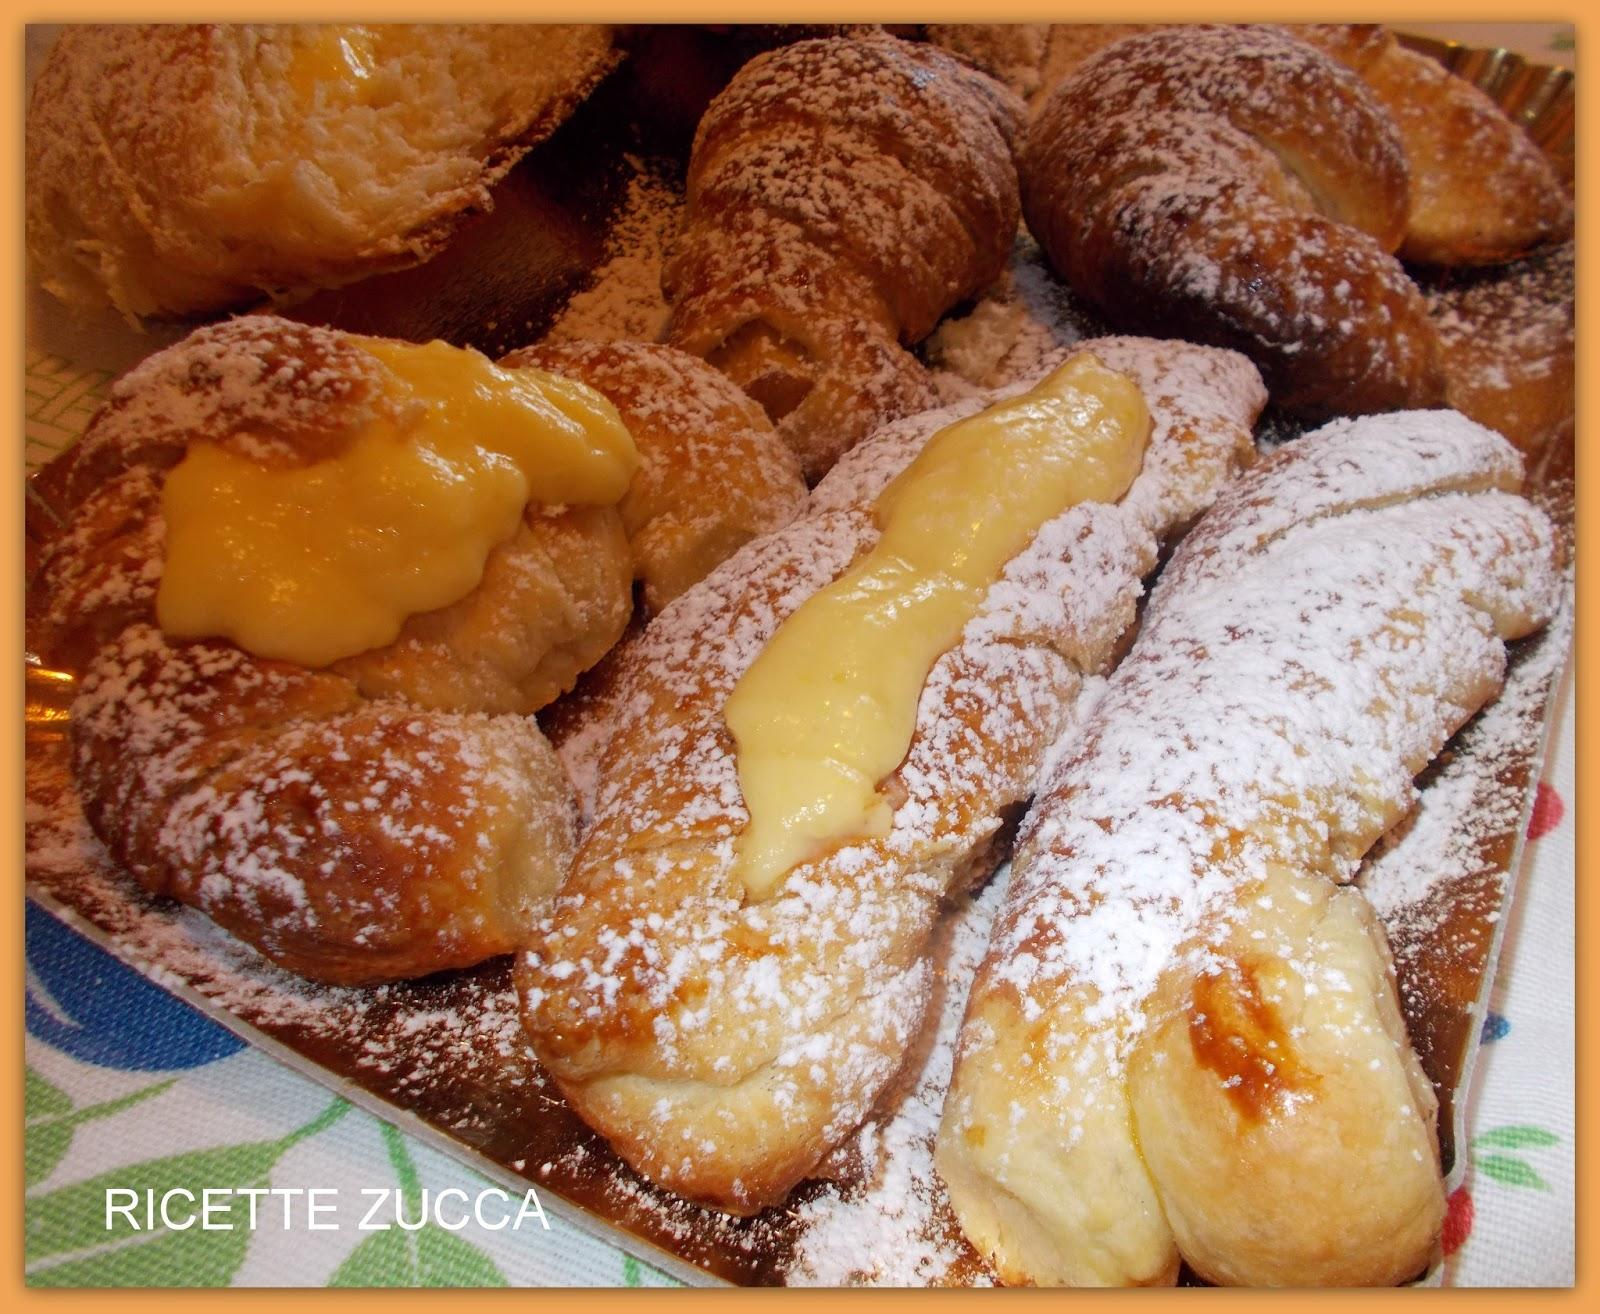 Ricette zucca ricetta brioches croissant for Ricette zucca